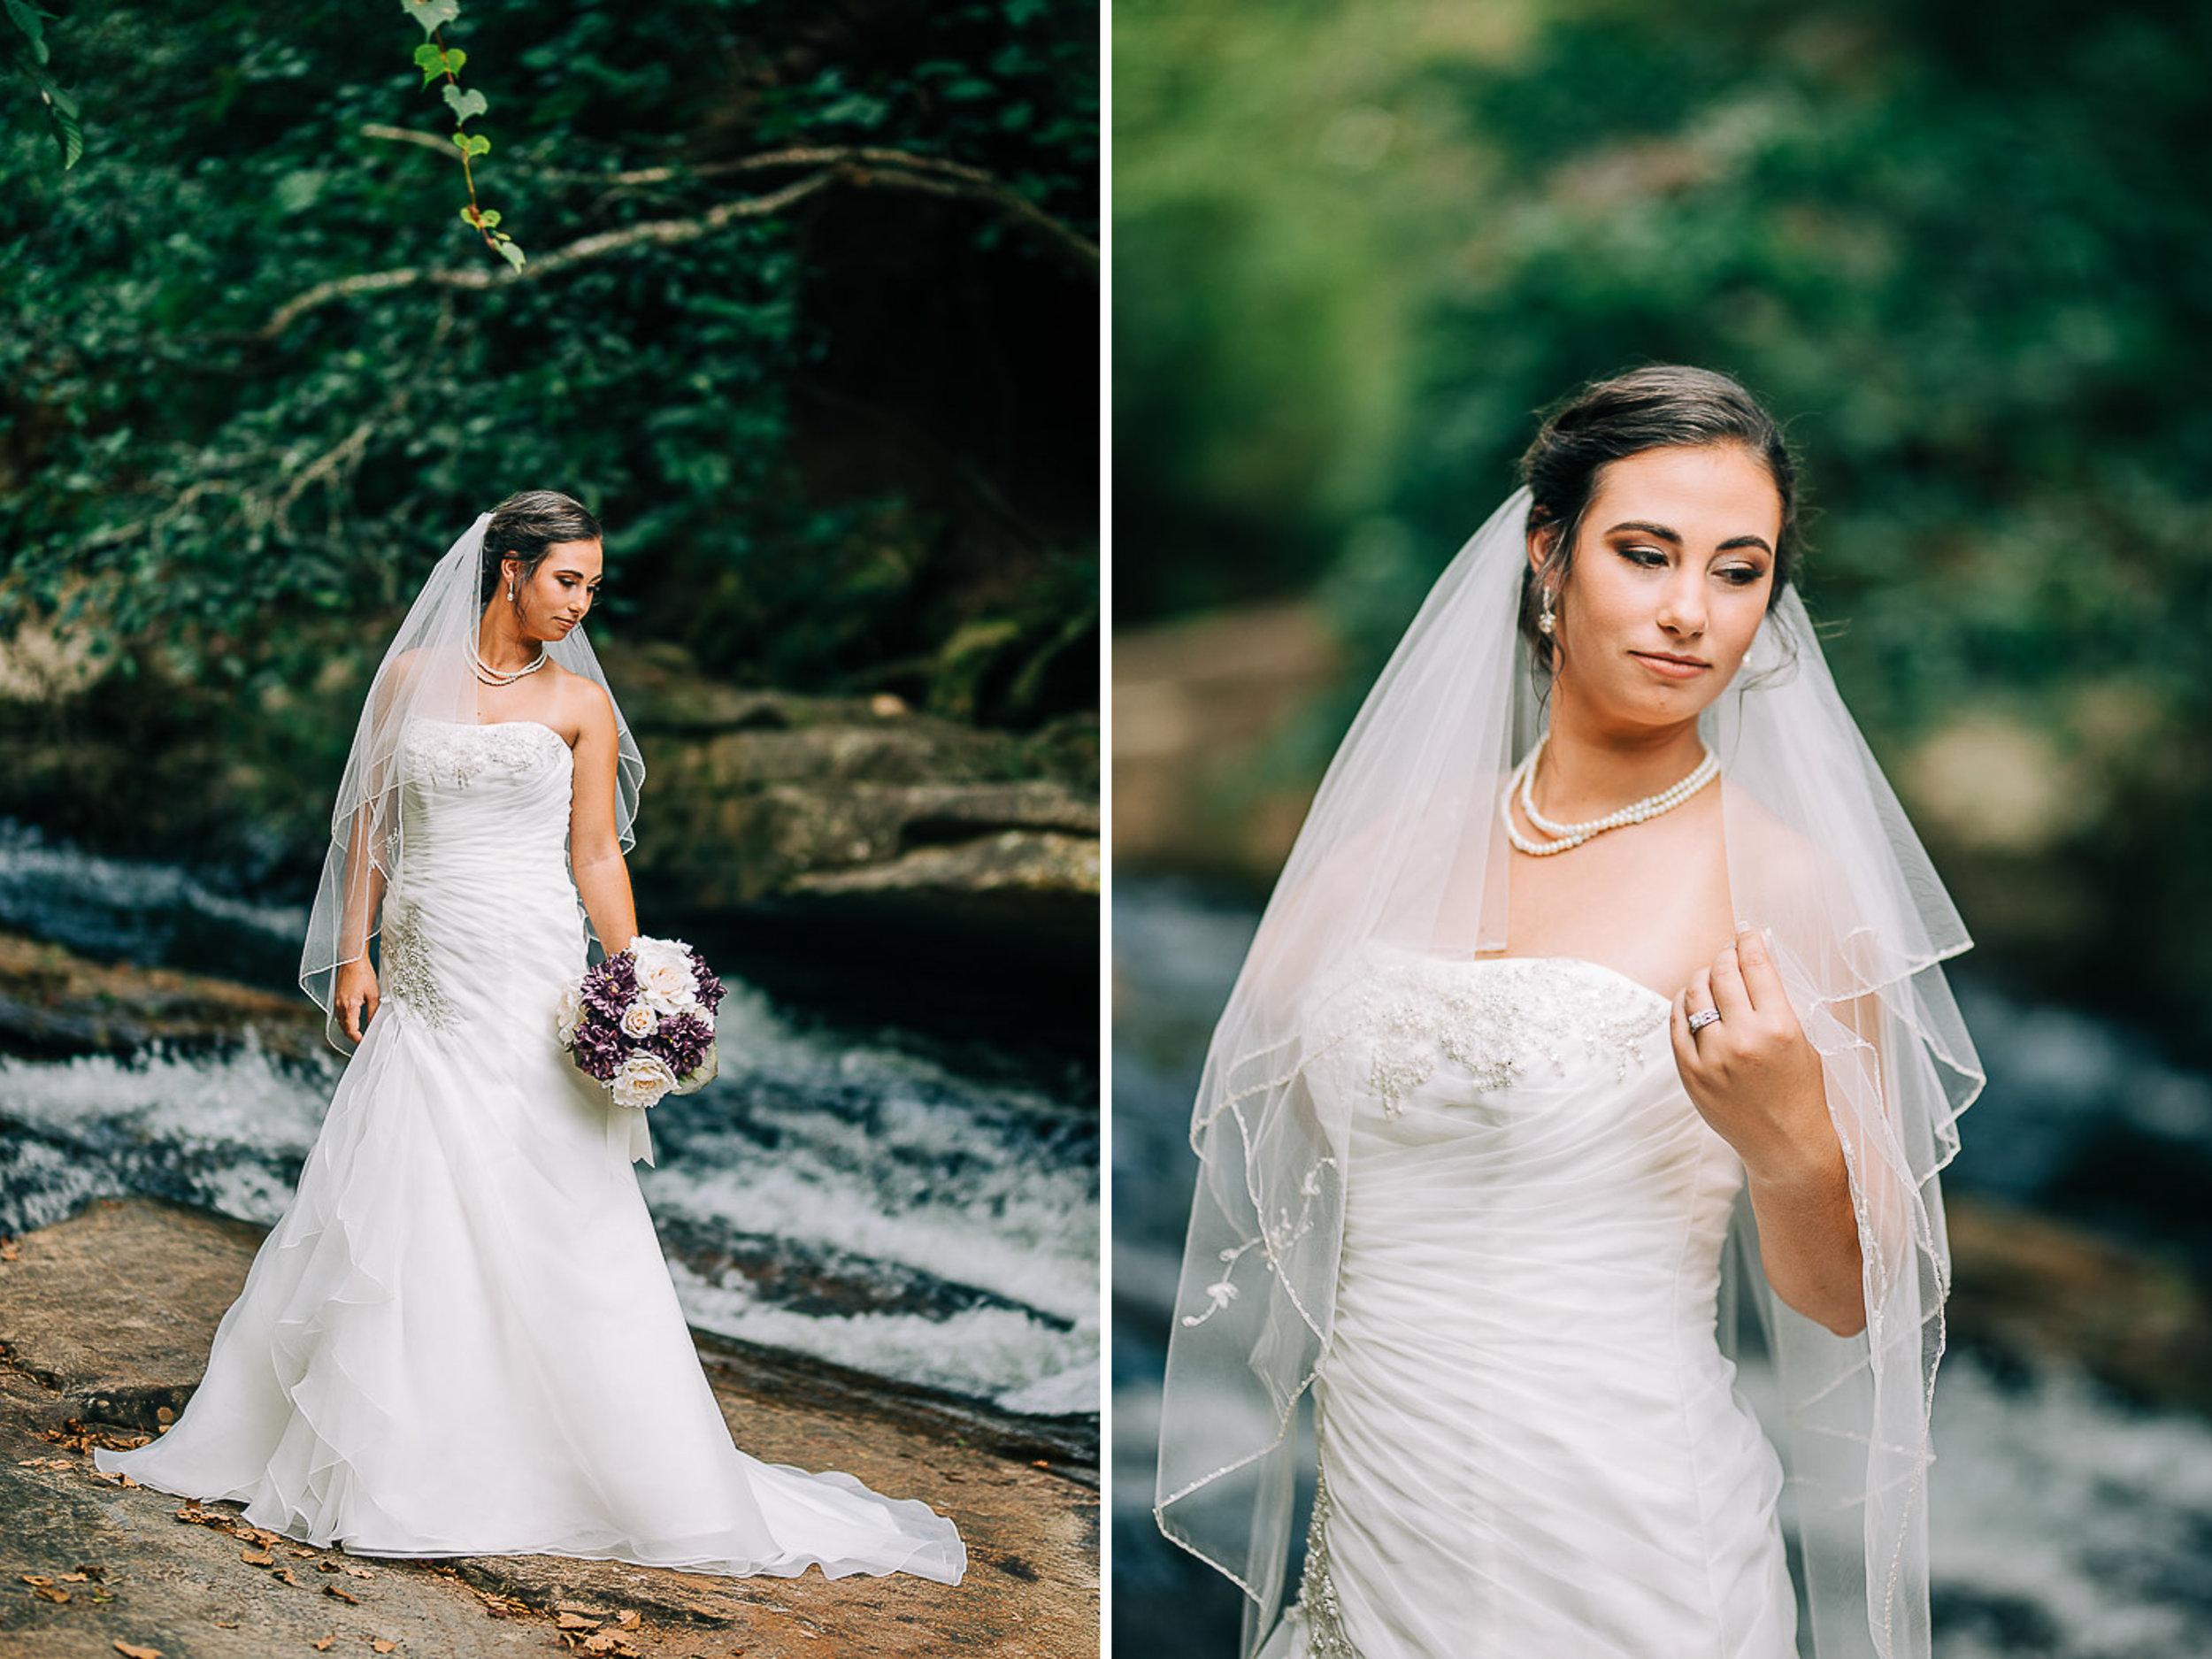 River Bridal Portraits, South Carolina Wedding Photographer, 02.jpg